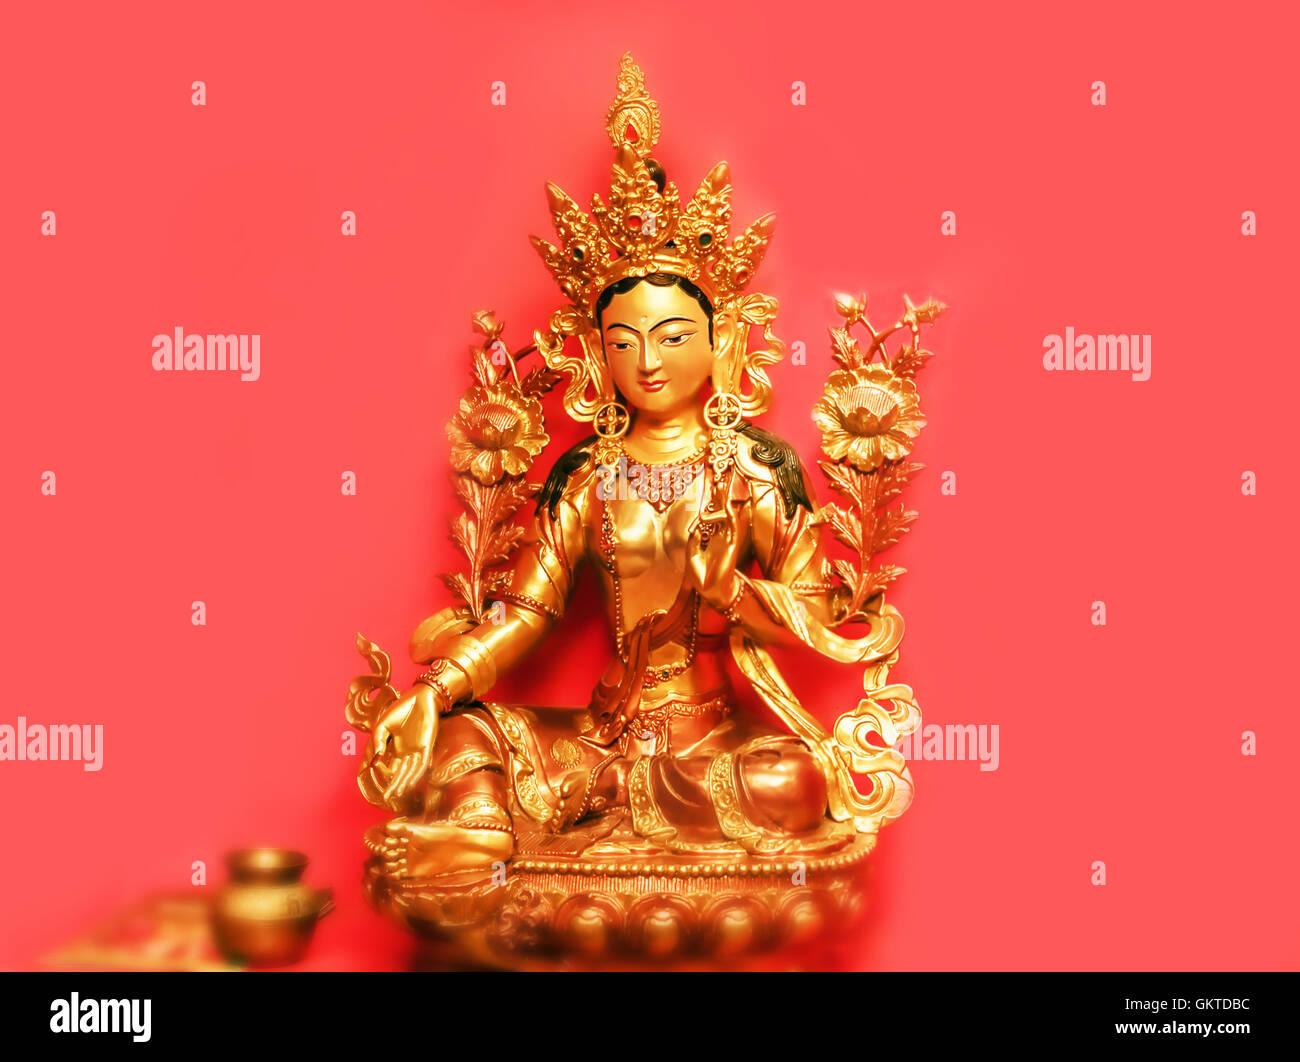 Bonita estatuilla dorada de la diosa Tara de Nepal Imagen De Stock